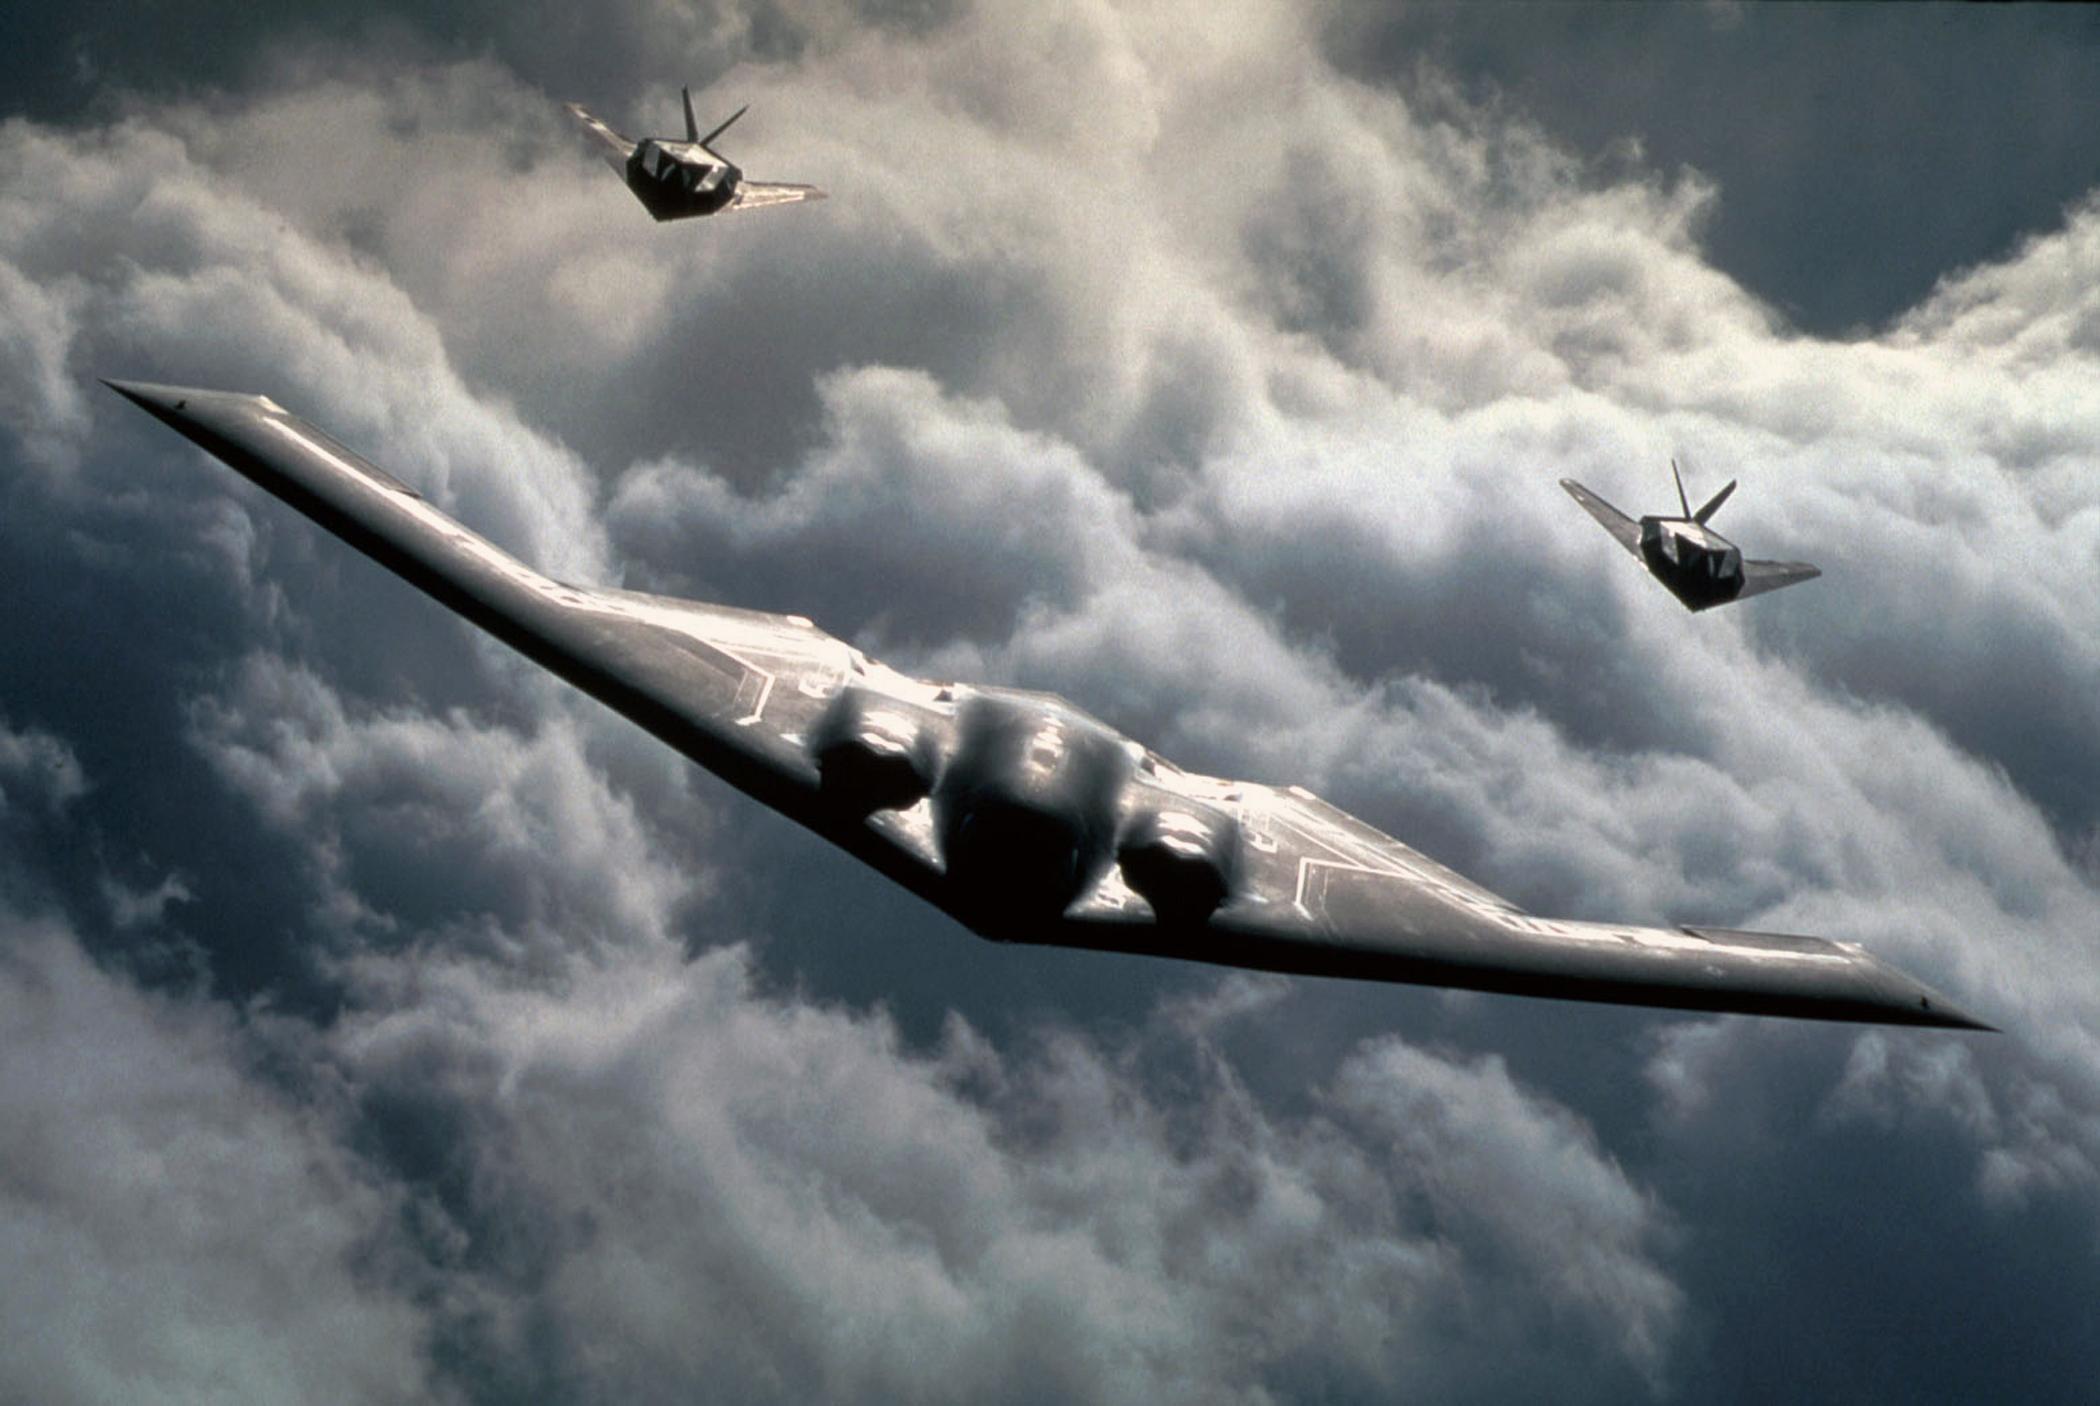 B 2 (航空機)の画像 p1_35